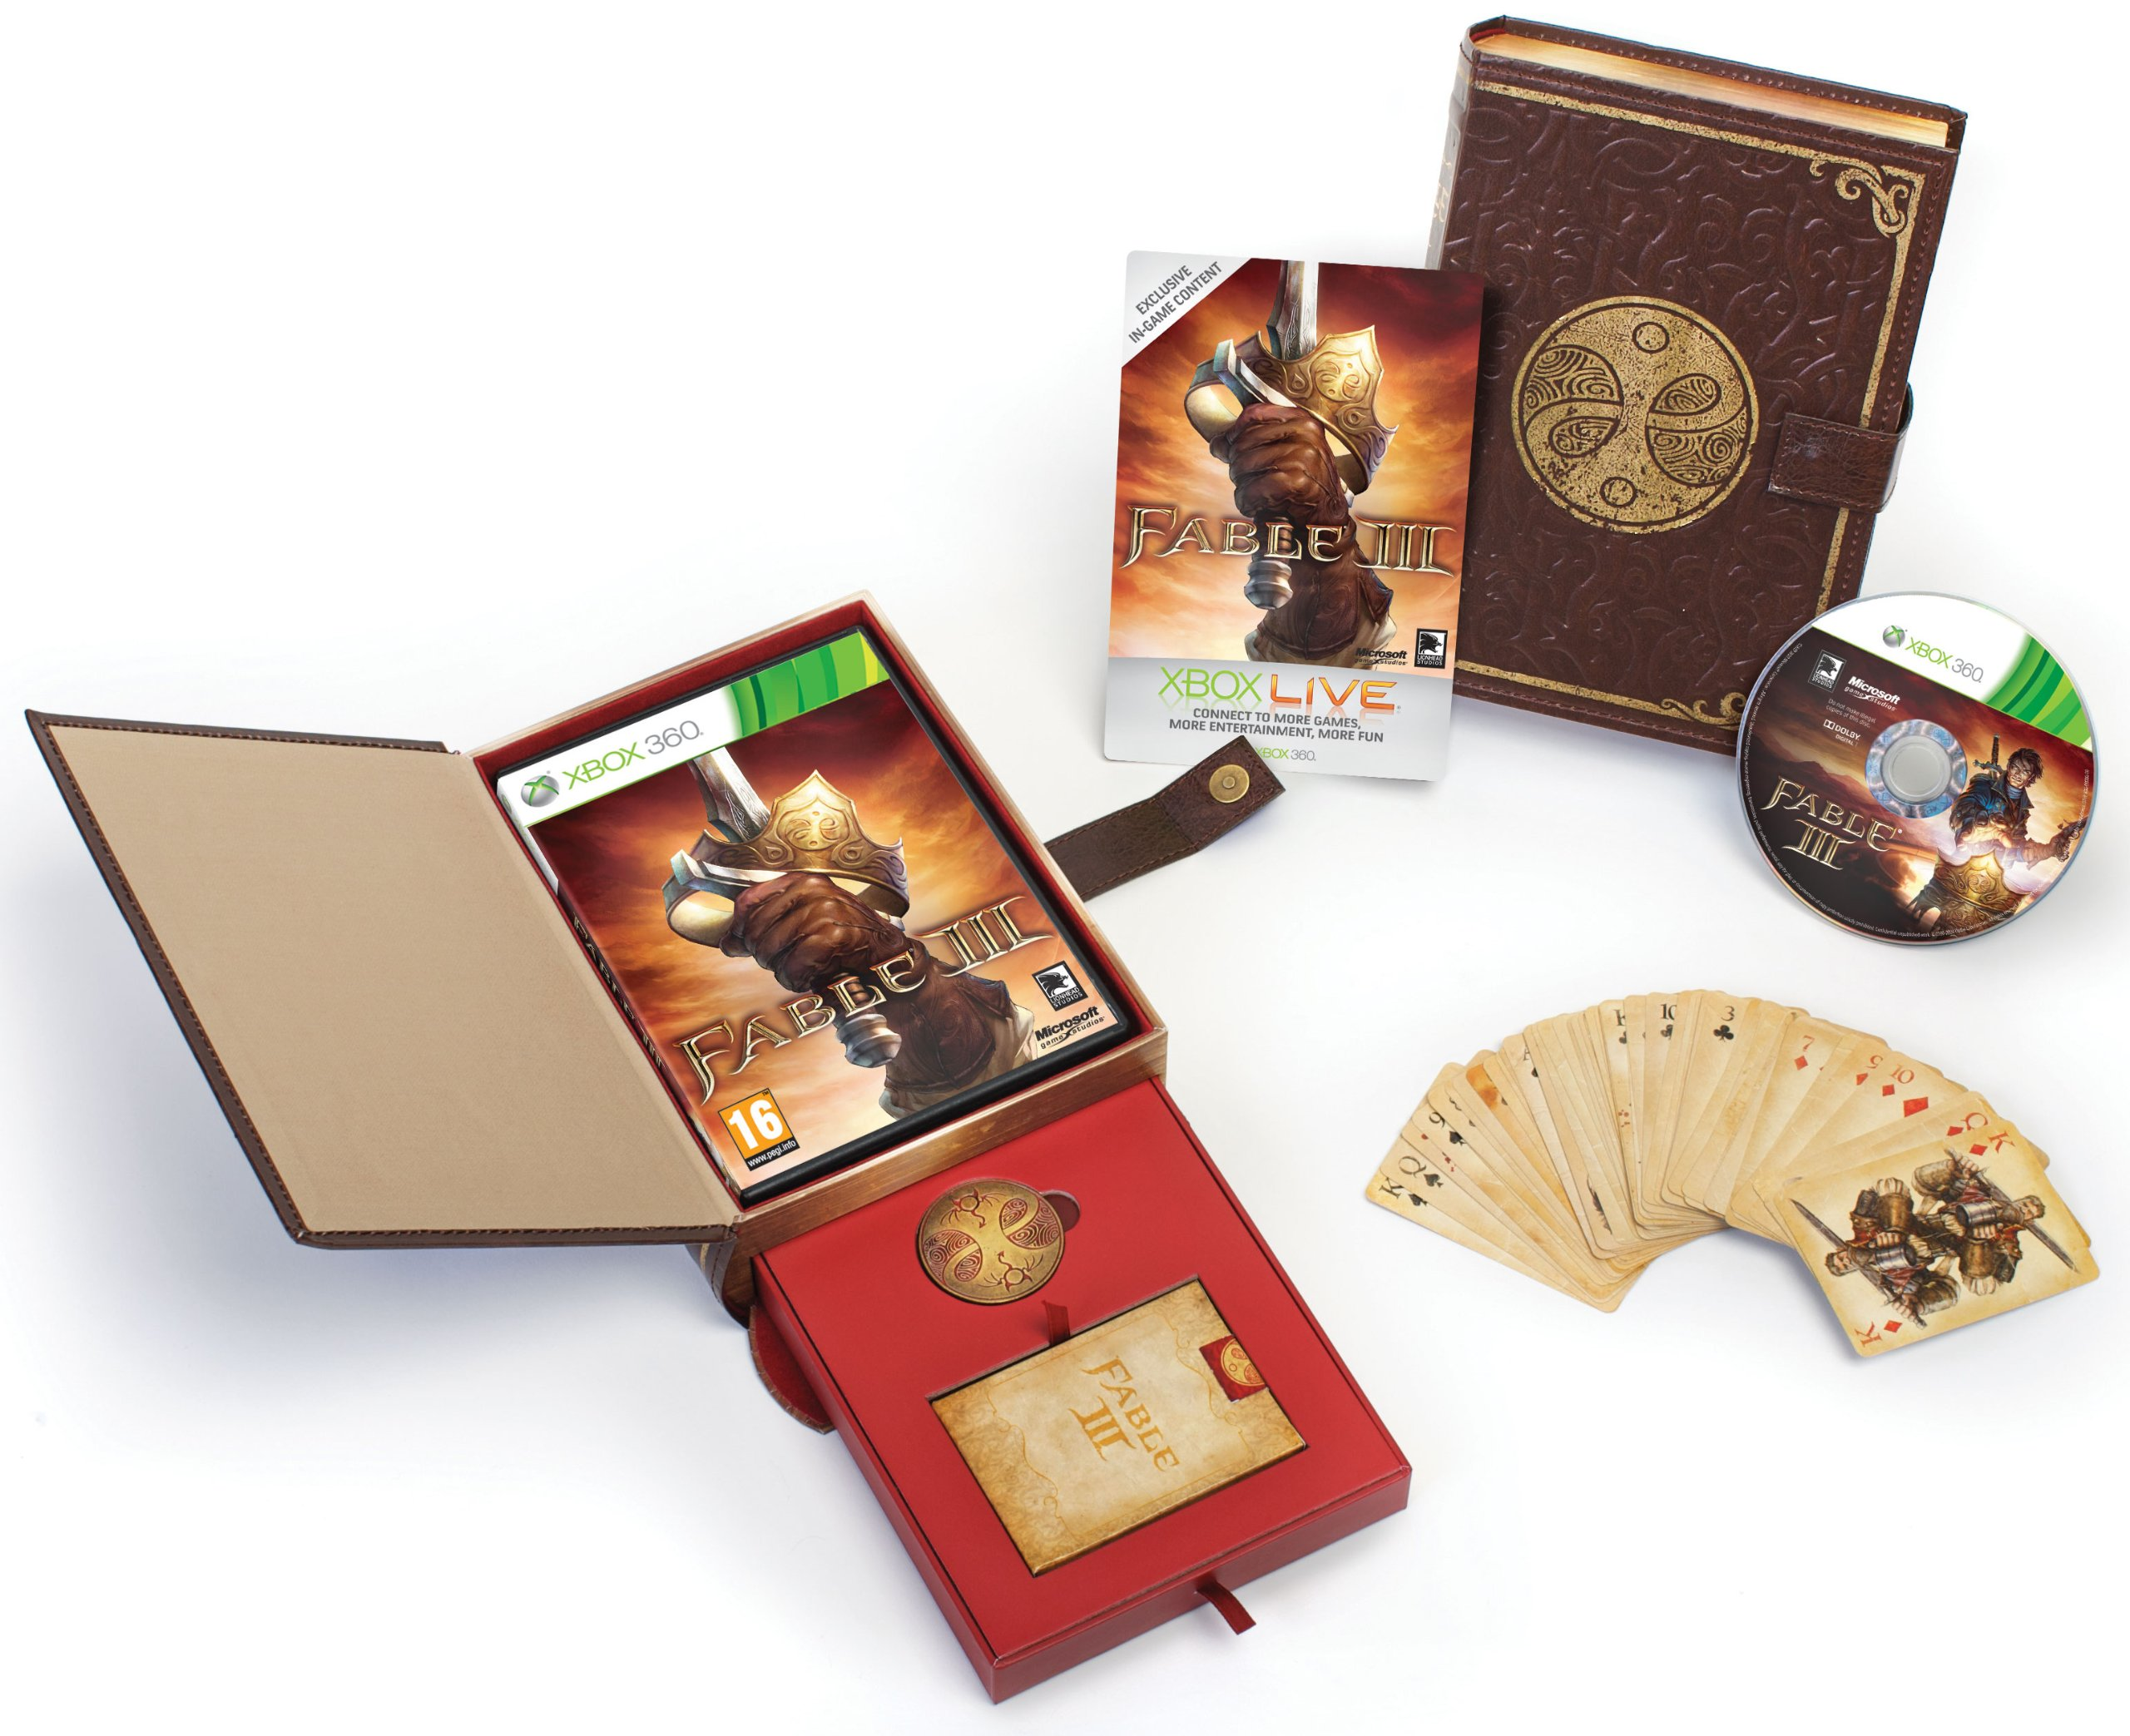 Amazon. Com: fable: limited edition bonus dvd: video games.